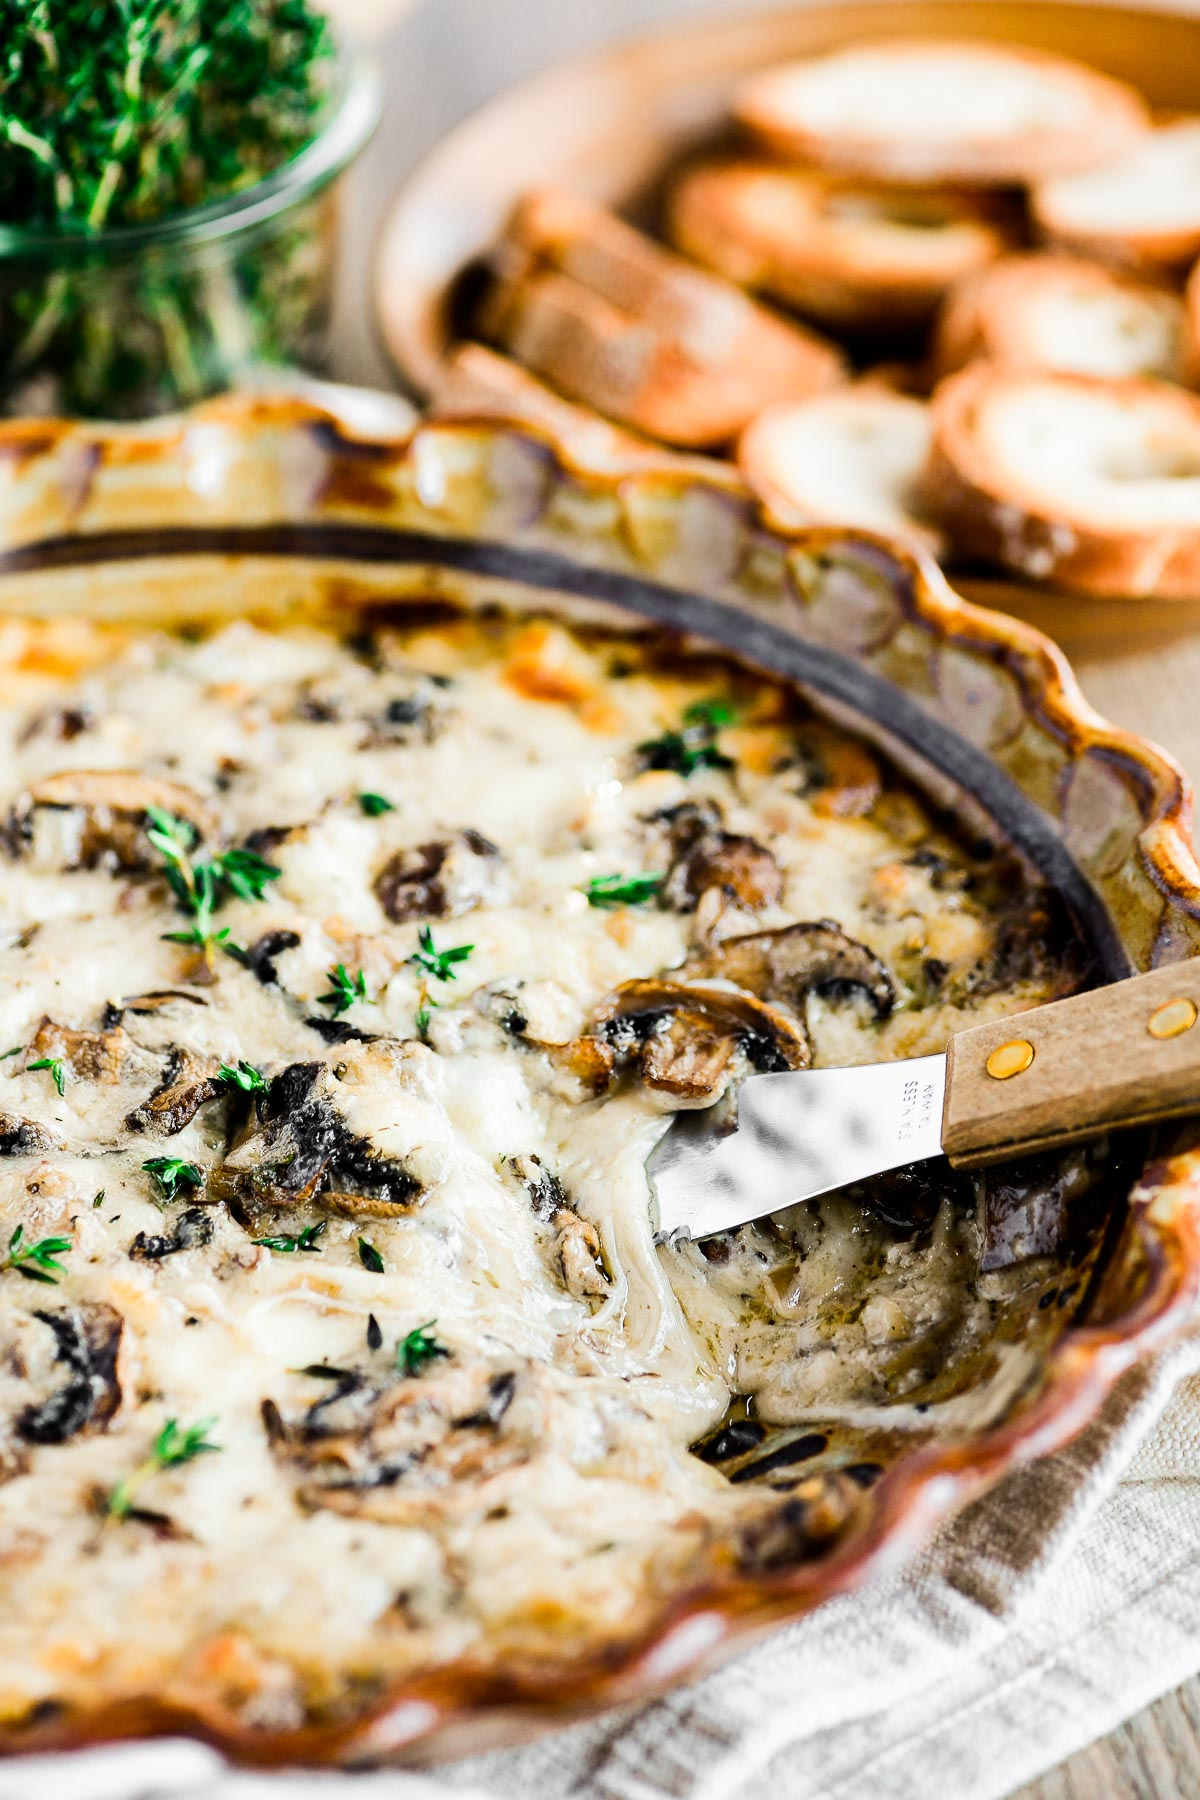 creamy cheesy mushroom dip in a baking dish